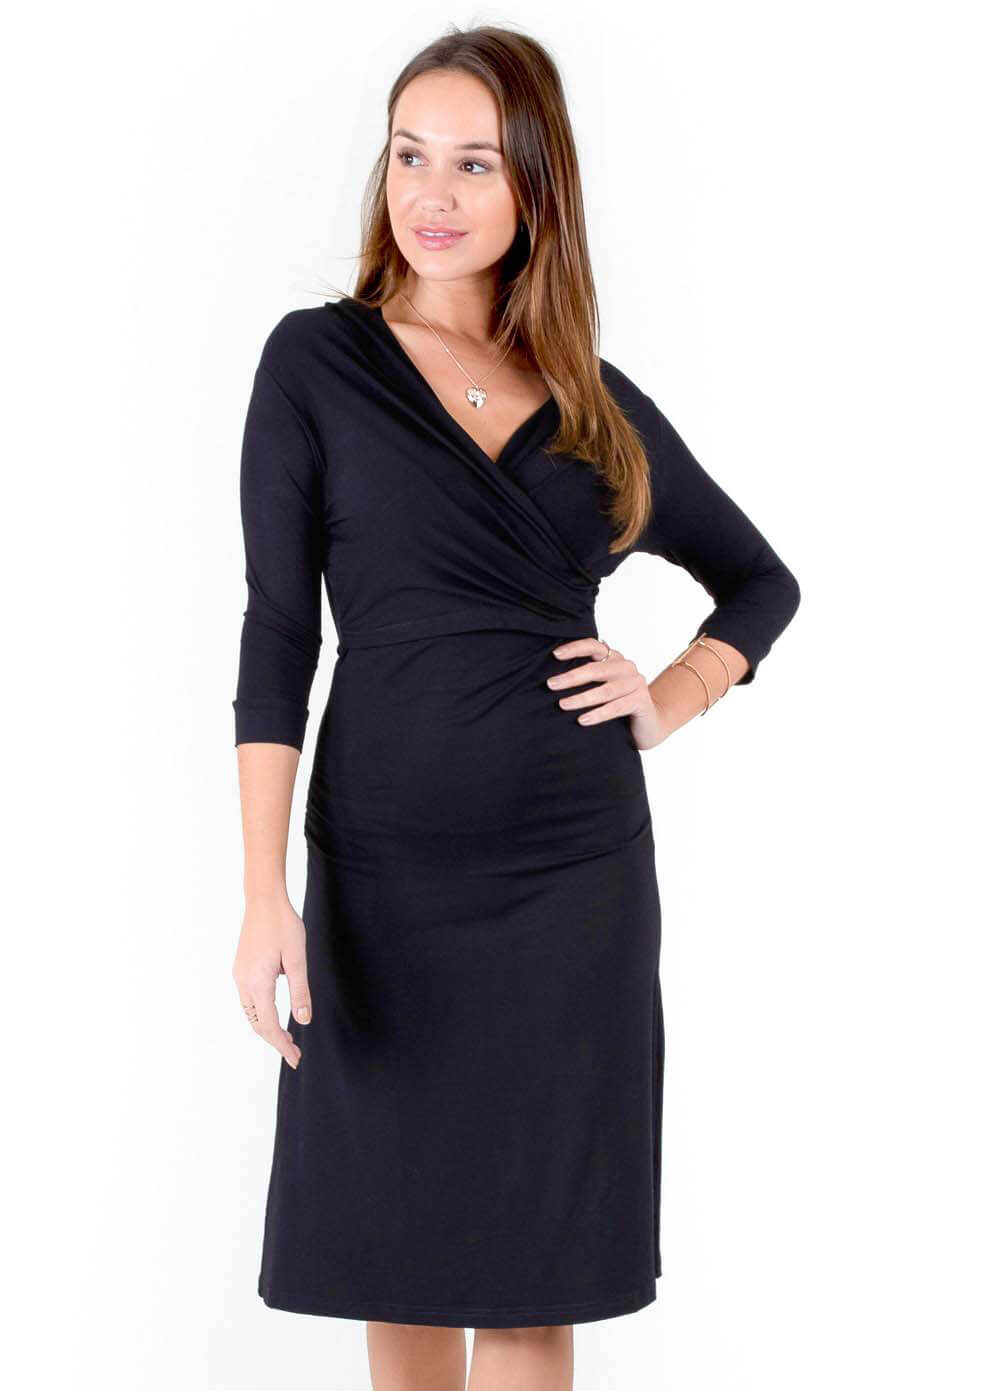 ca694b7f6d3 Shell Maternity Nursing Dress in Black by Quack Nursingwear